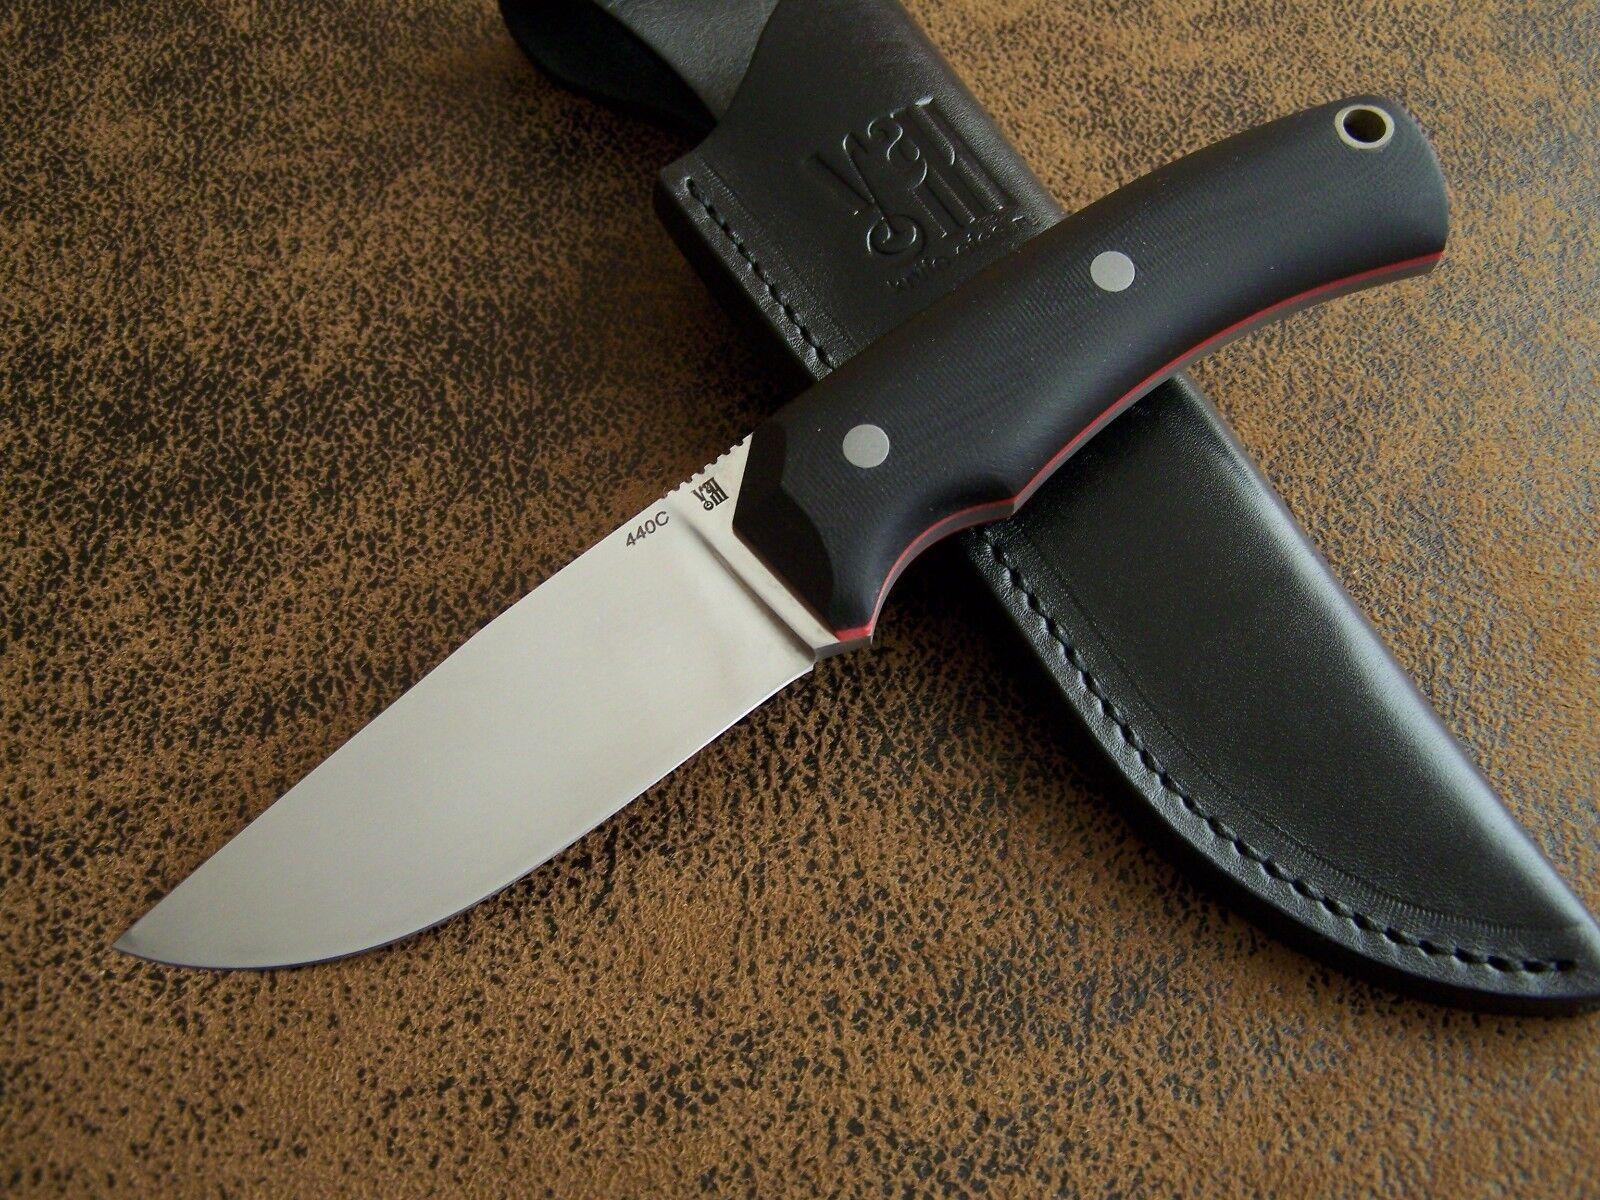 D. Uldanov Exklusives Custom Messer Outdoormesser, Jagdmesser 440C Stahl 59-HRC    Kompletter Spezifikationsbereich